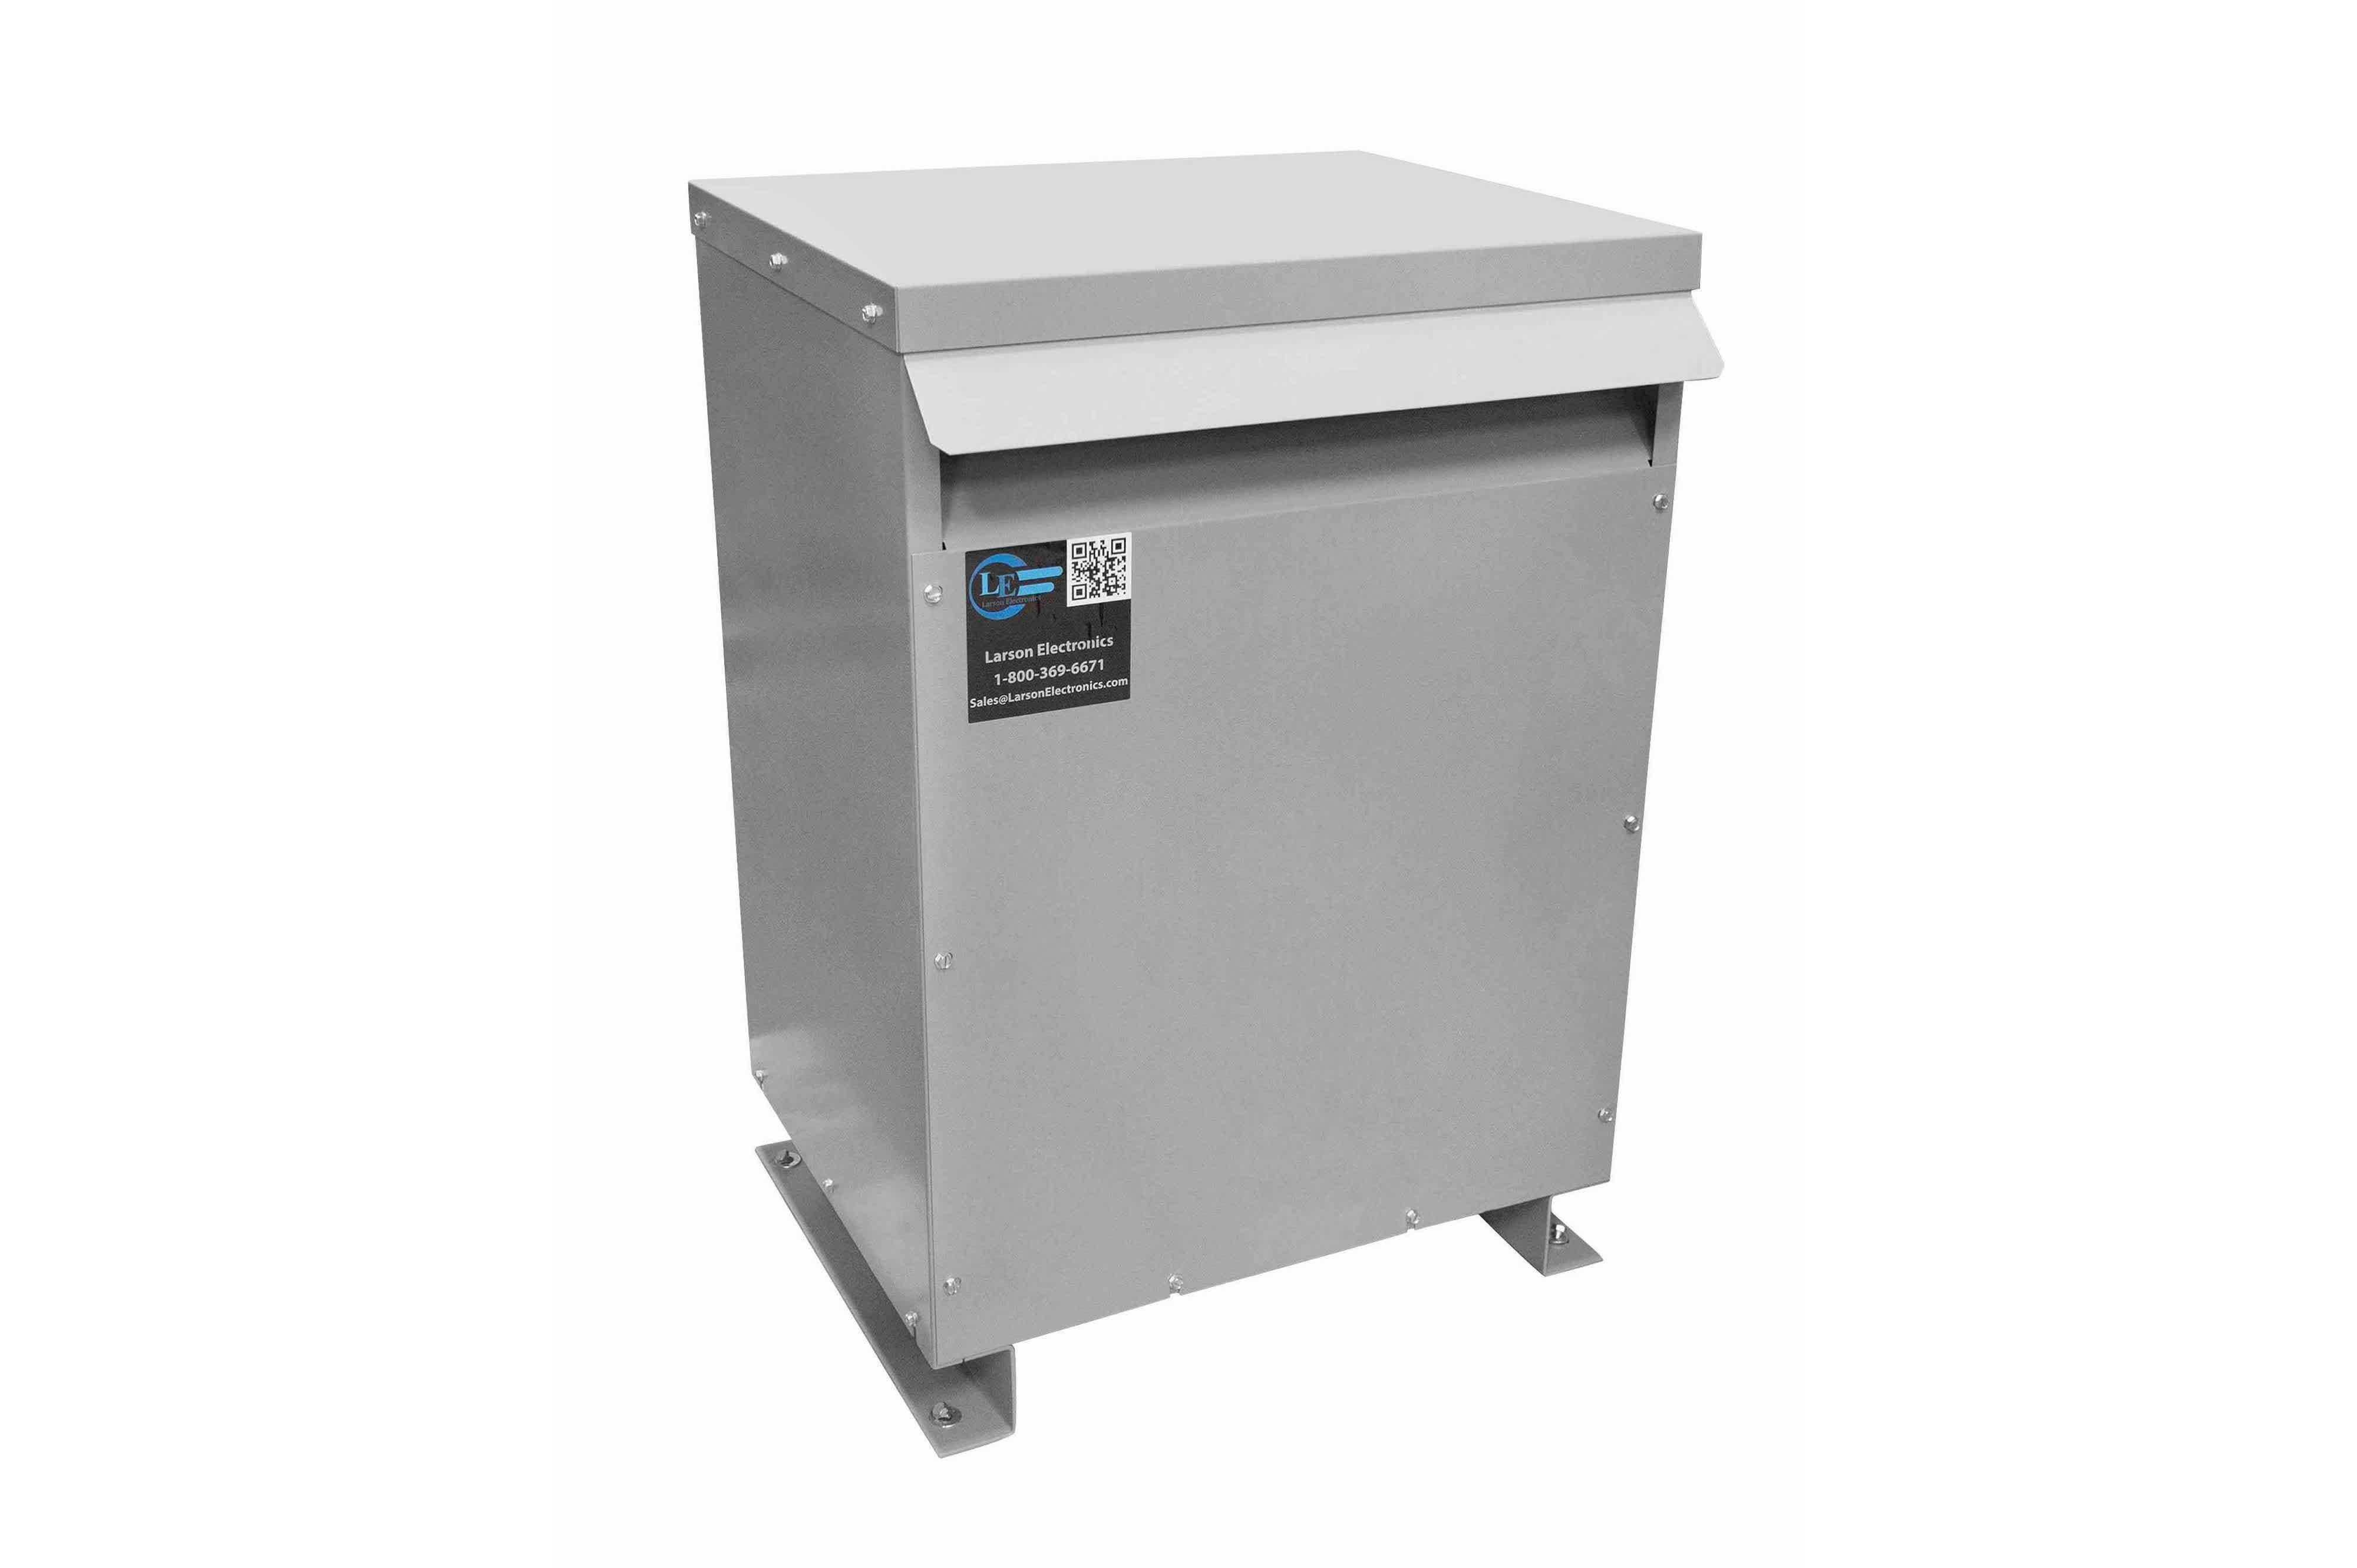 80 kVA 3PH Isolation Transformer, 208V Wye Primary, 208Y/120 Wye-N Secondary, N3R, Ventilated, 60 Hz